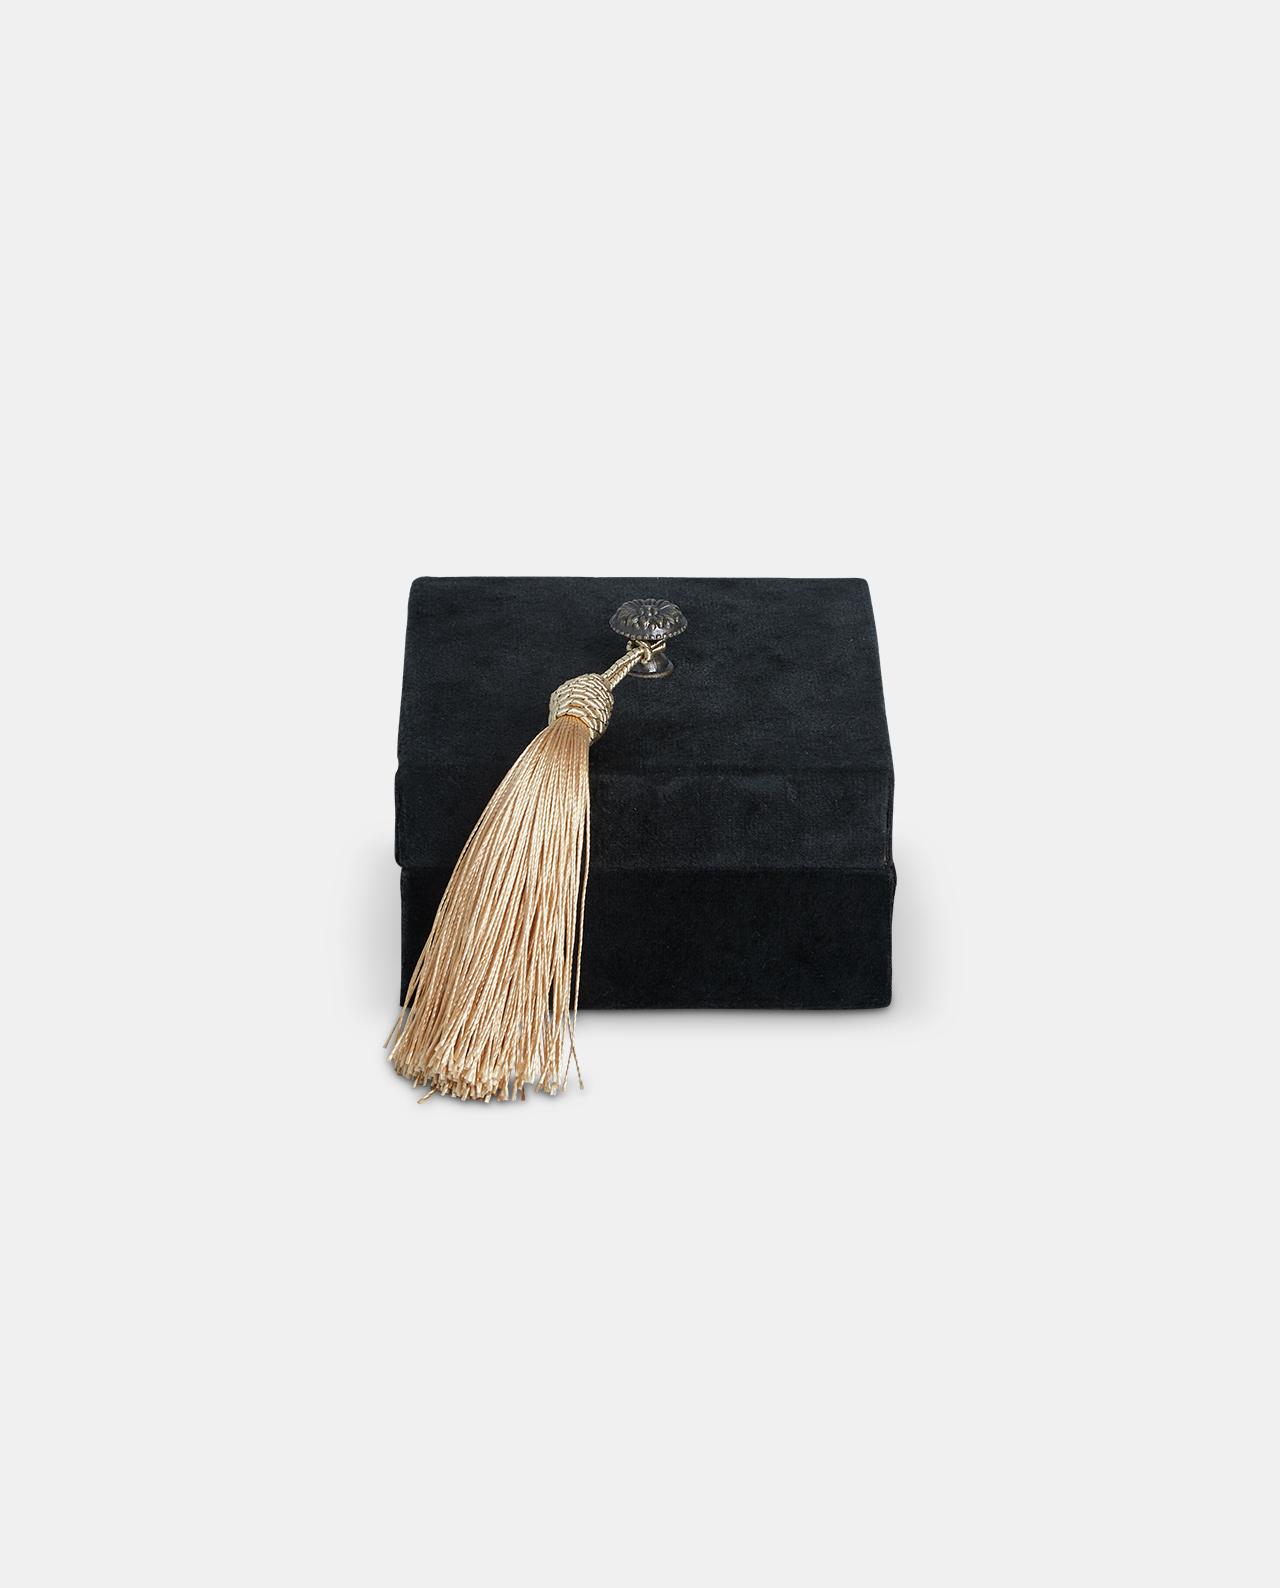 Small Black Velvet Decorative Box